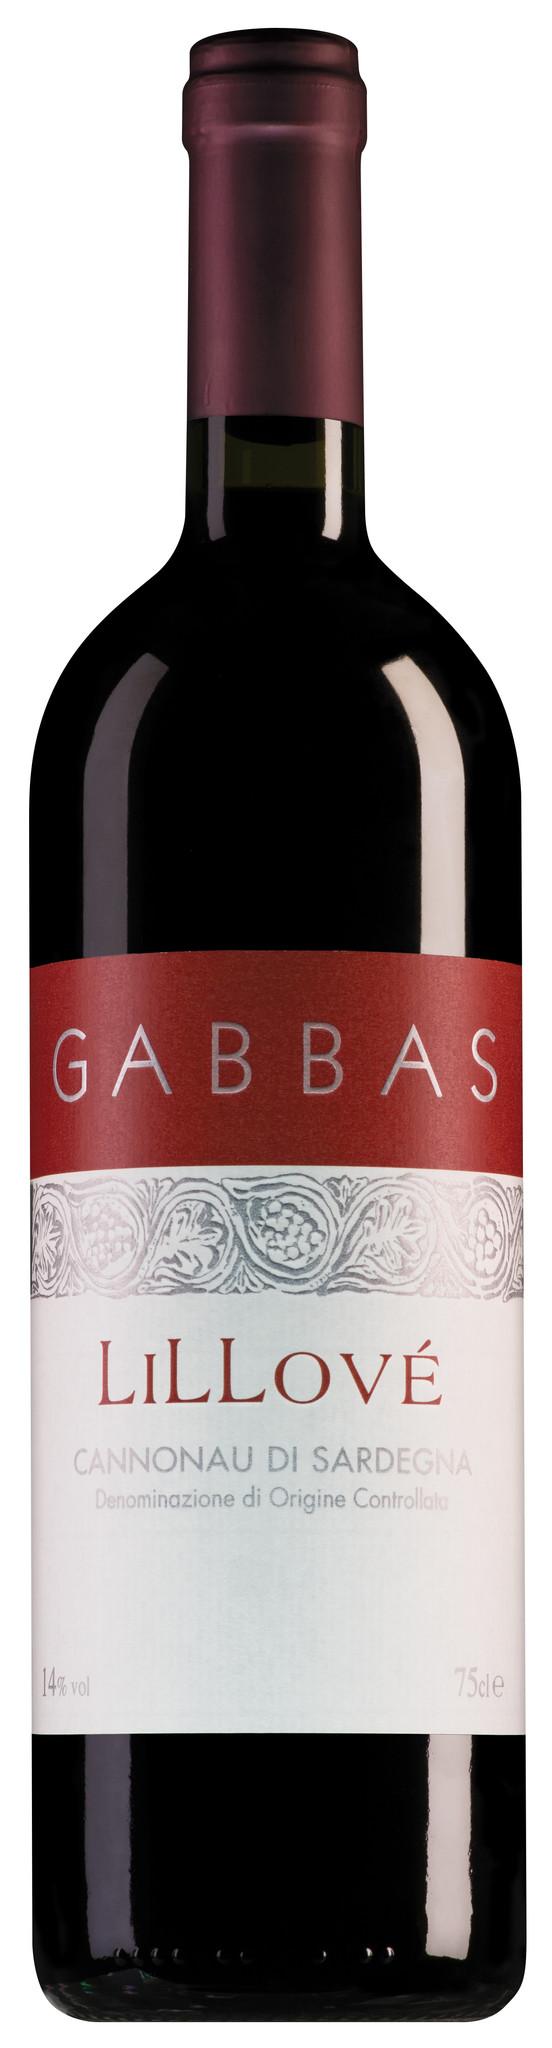 Gabbas Cannonau di Sardegna Lillové 2019